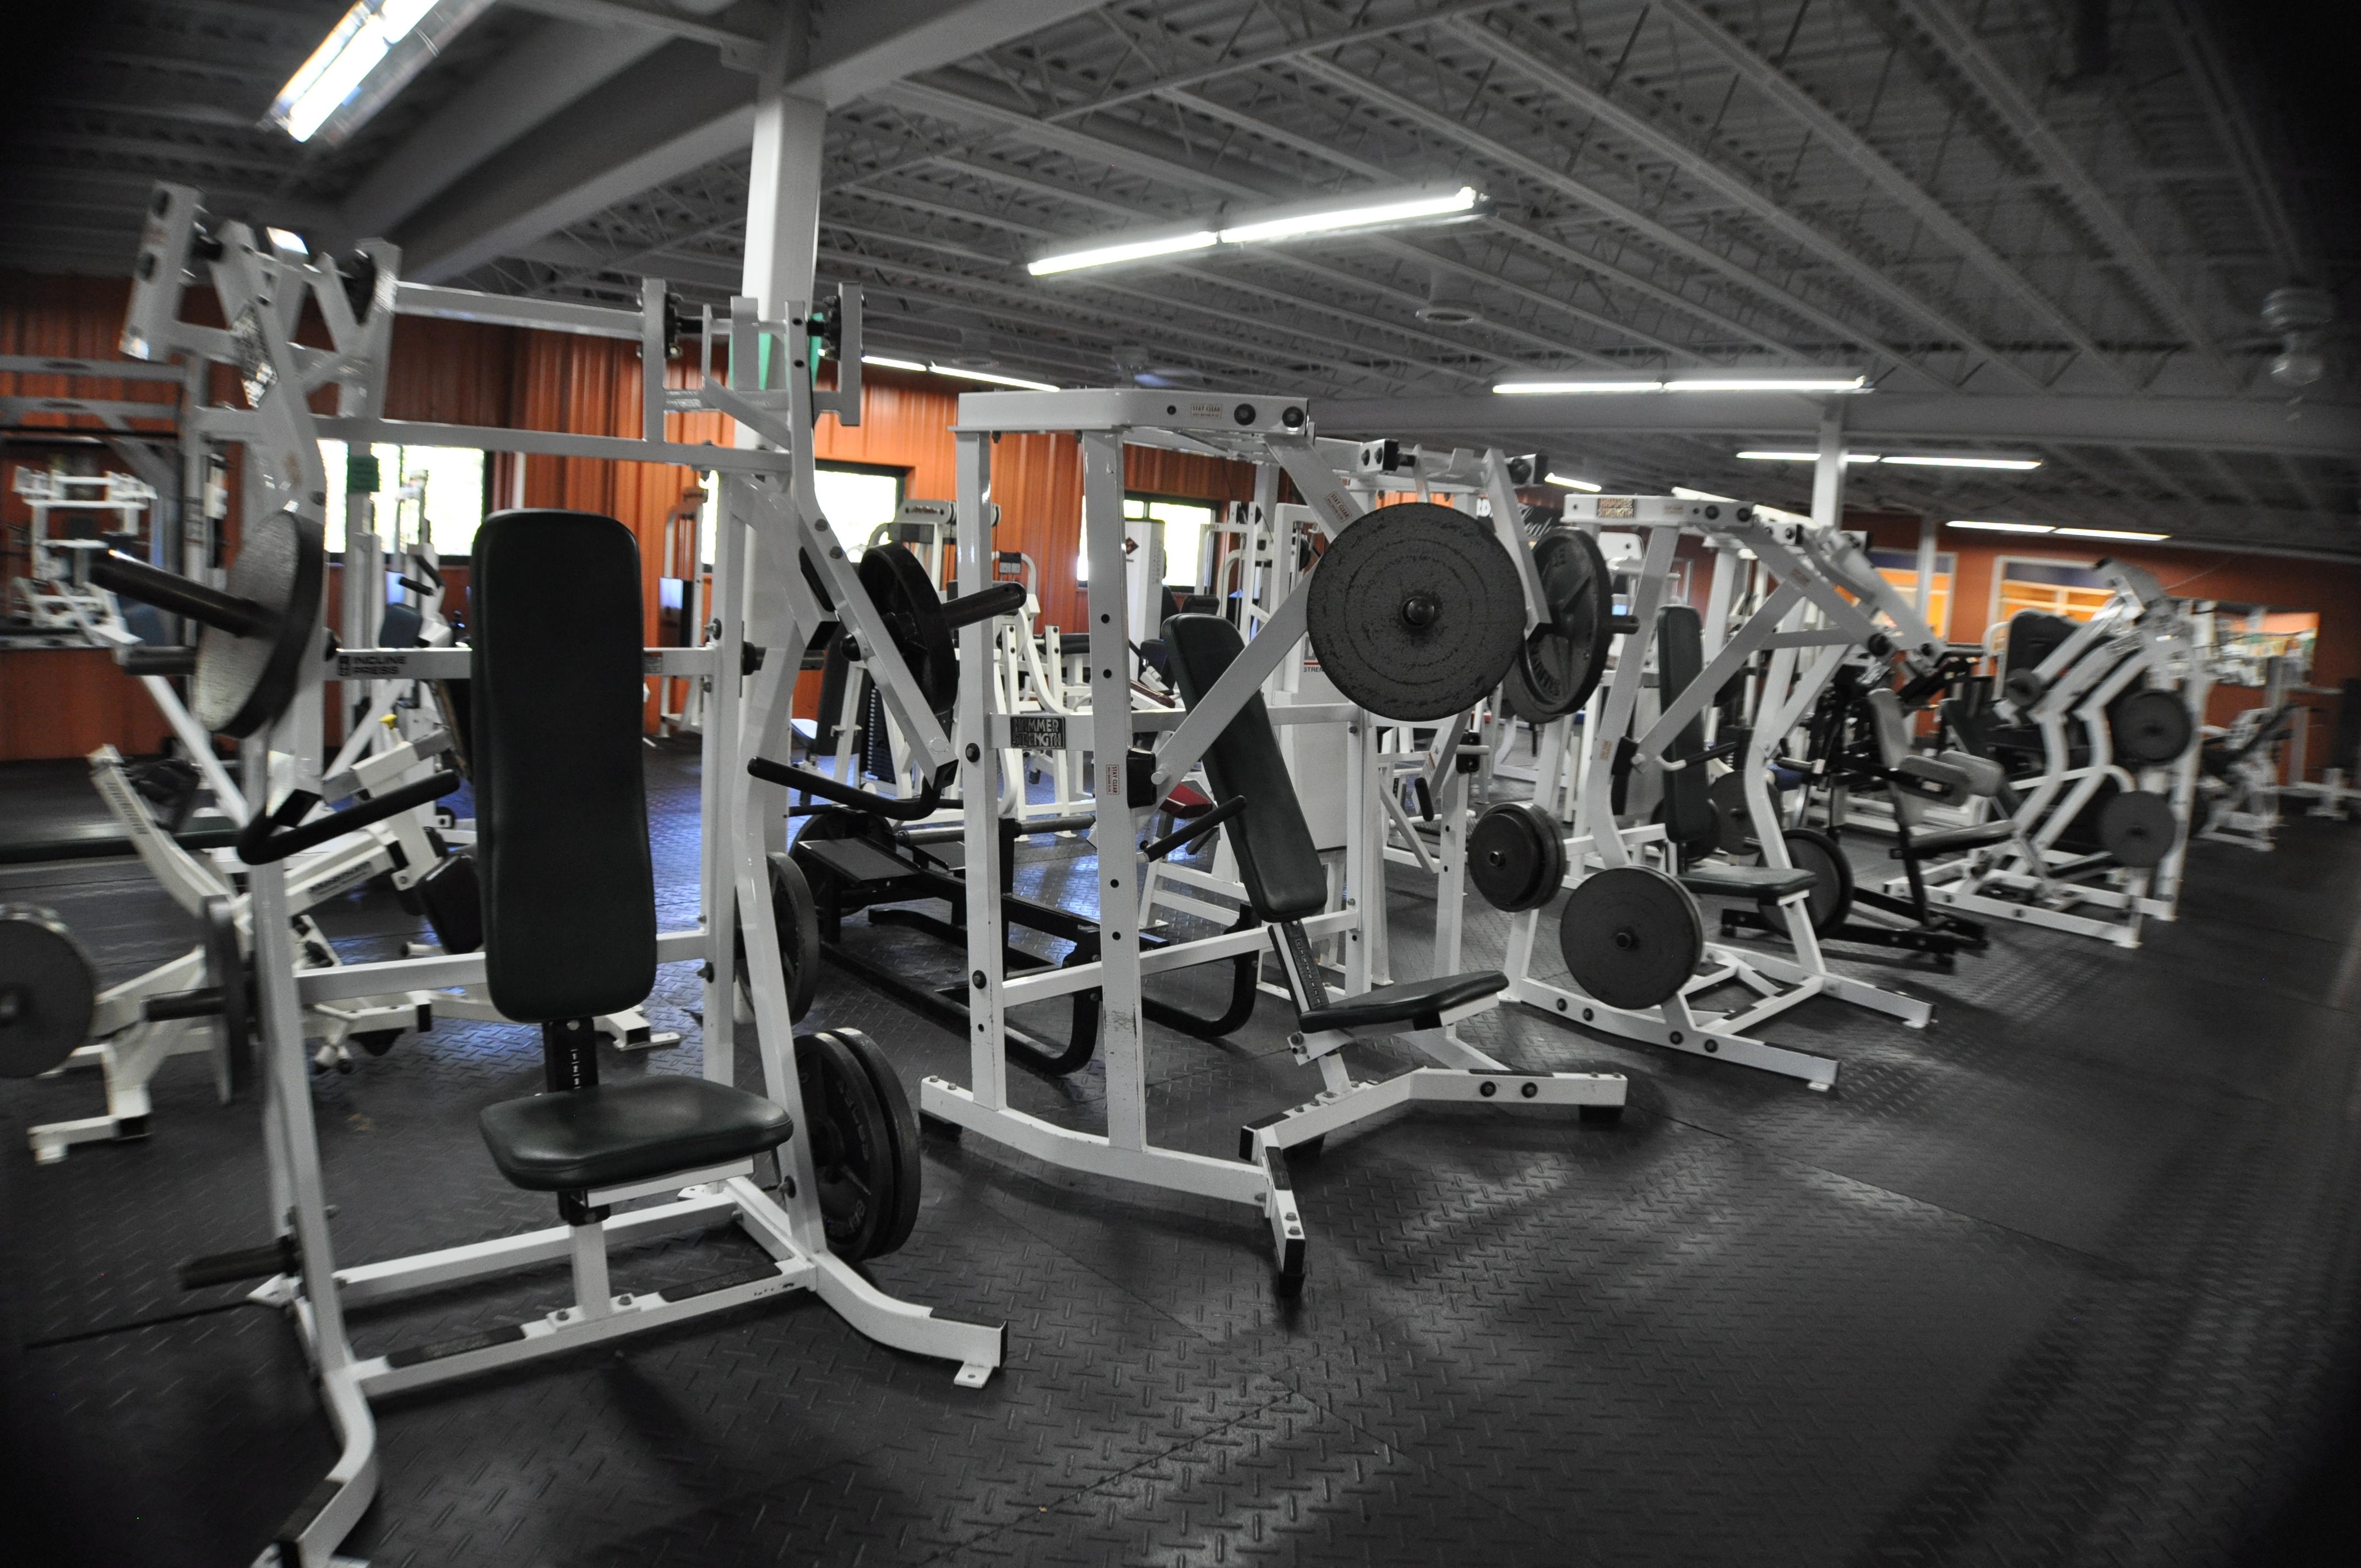 24 hour weight training